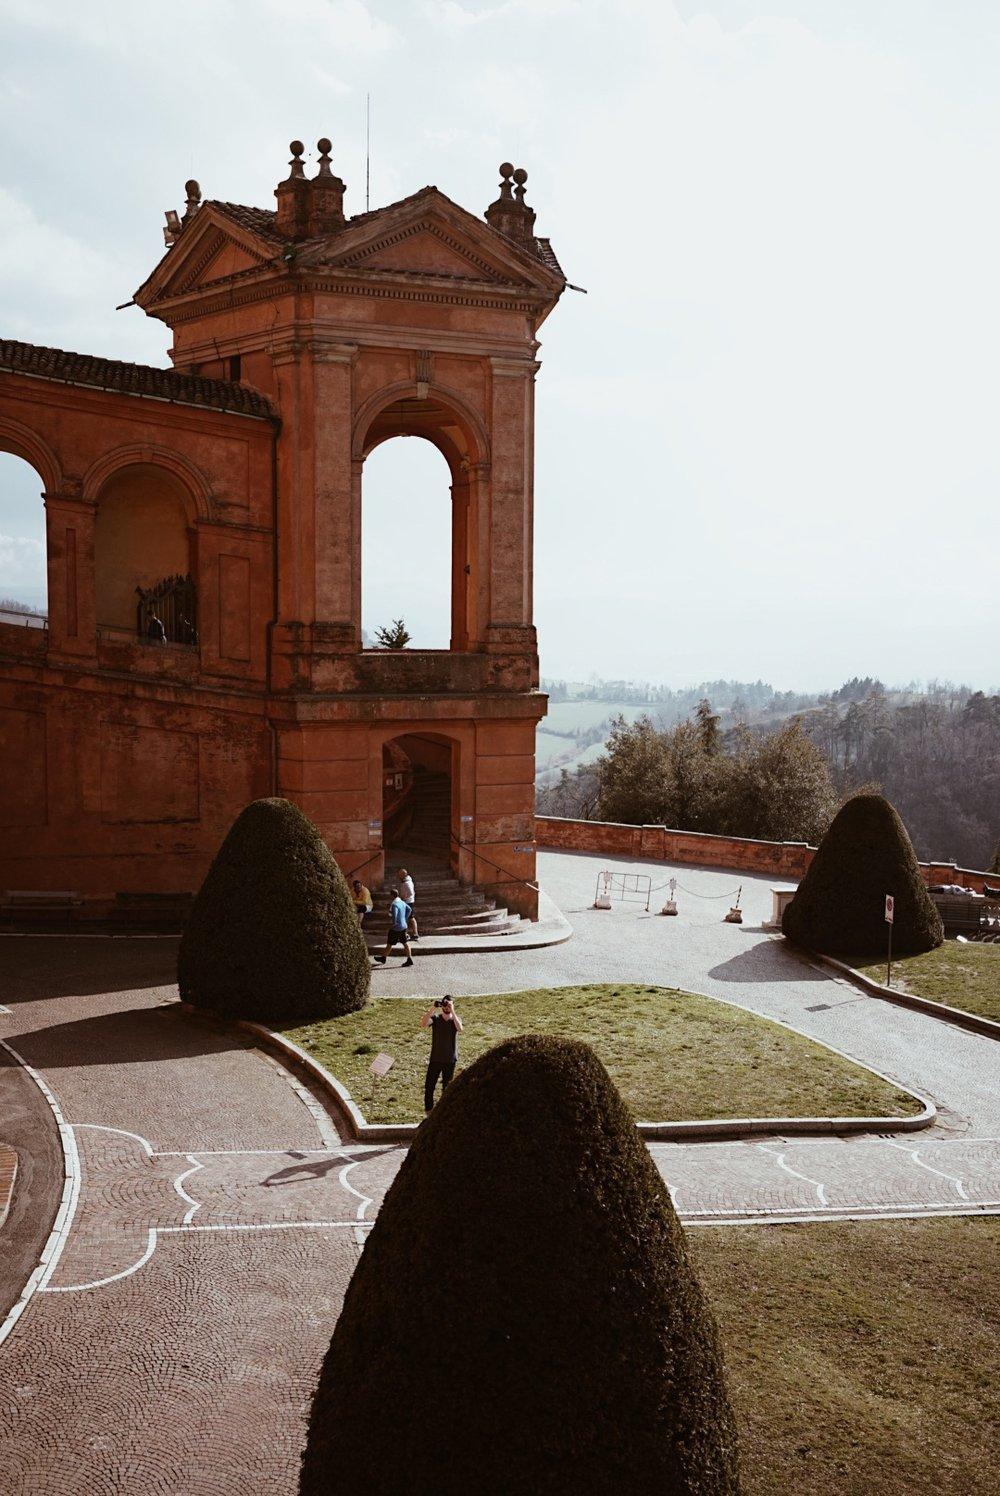 The Sanctuary of Madonna di San Luca